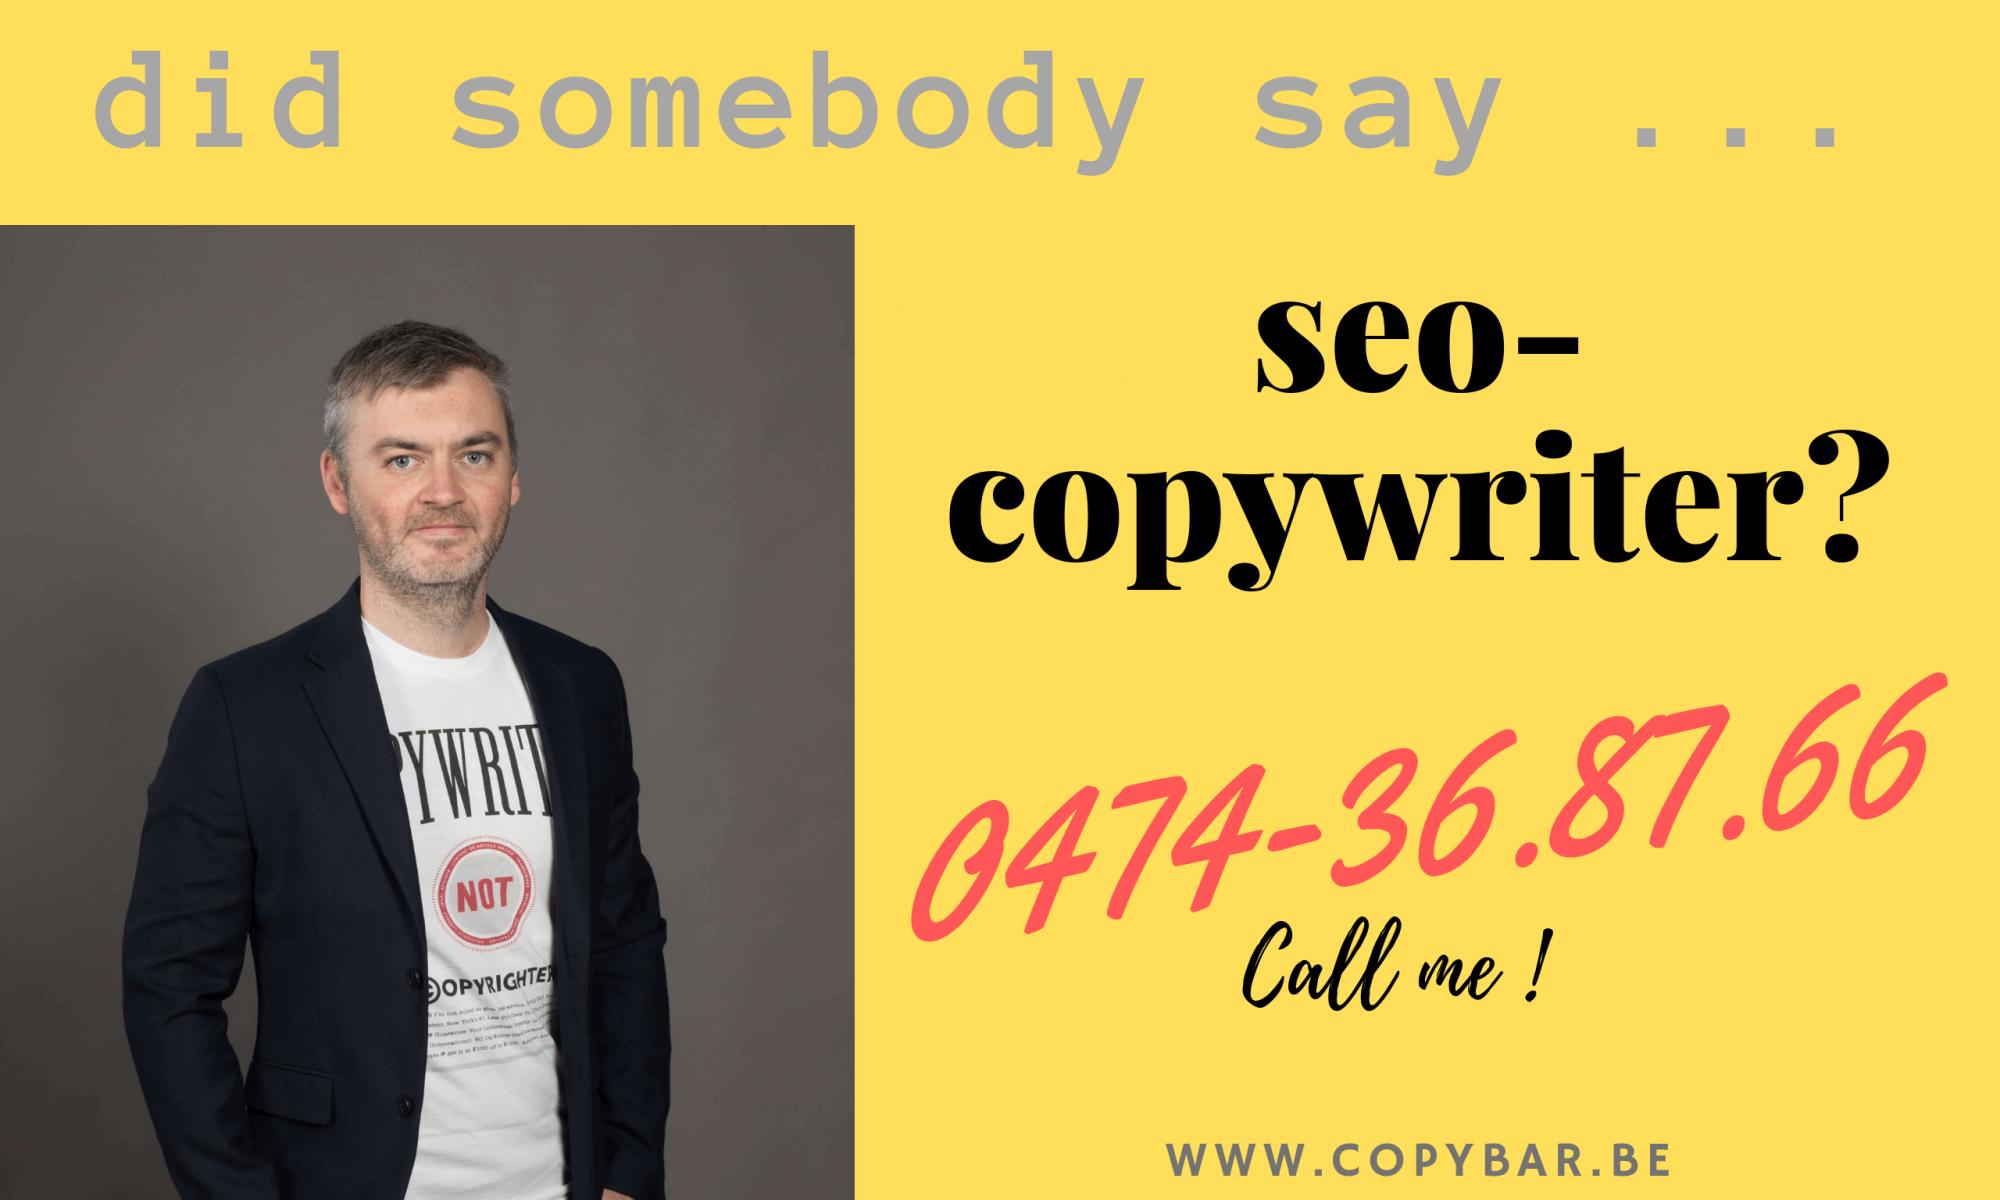 seo-copywriter nodig of gezocht